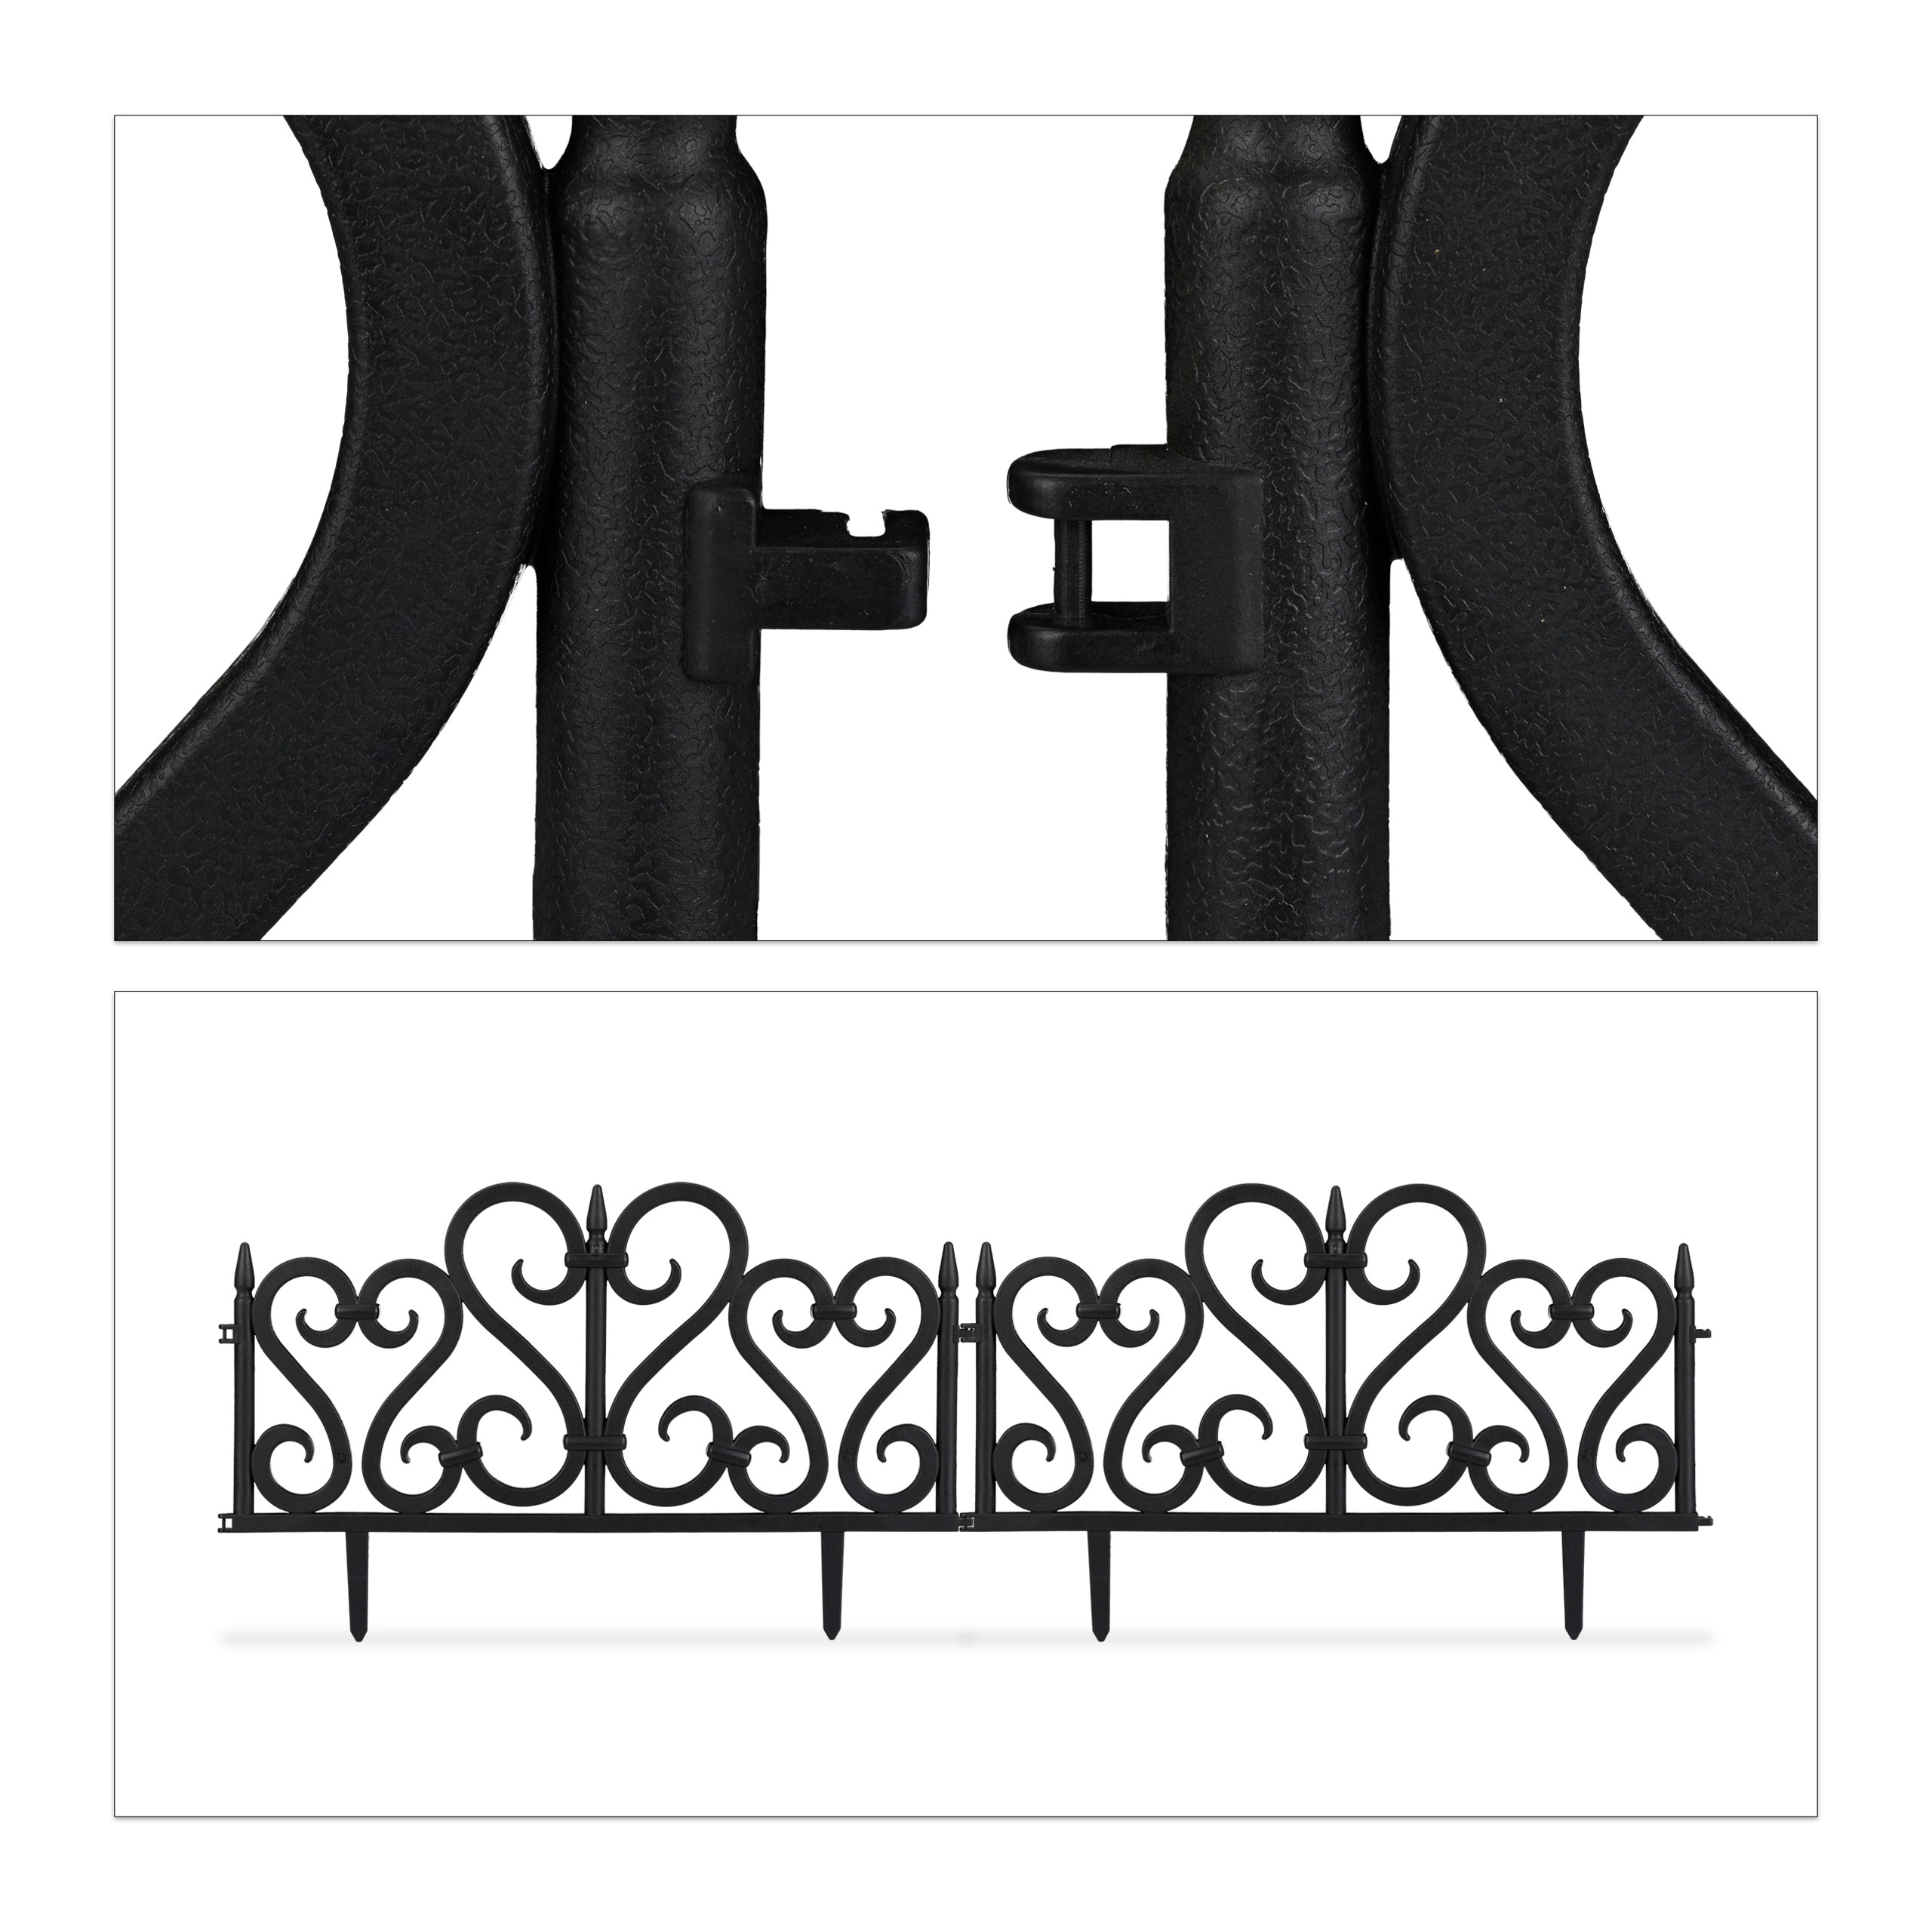 Valla-jardin-Borde-cesped-Bordillo-limitador-jardin-Set-4-separadores-cesped miniatura 14